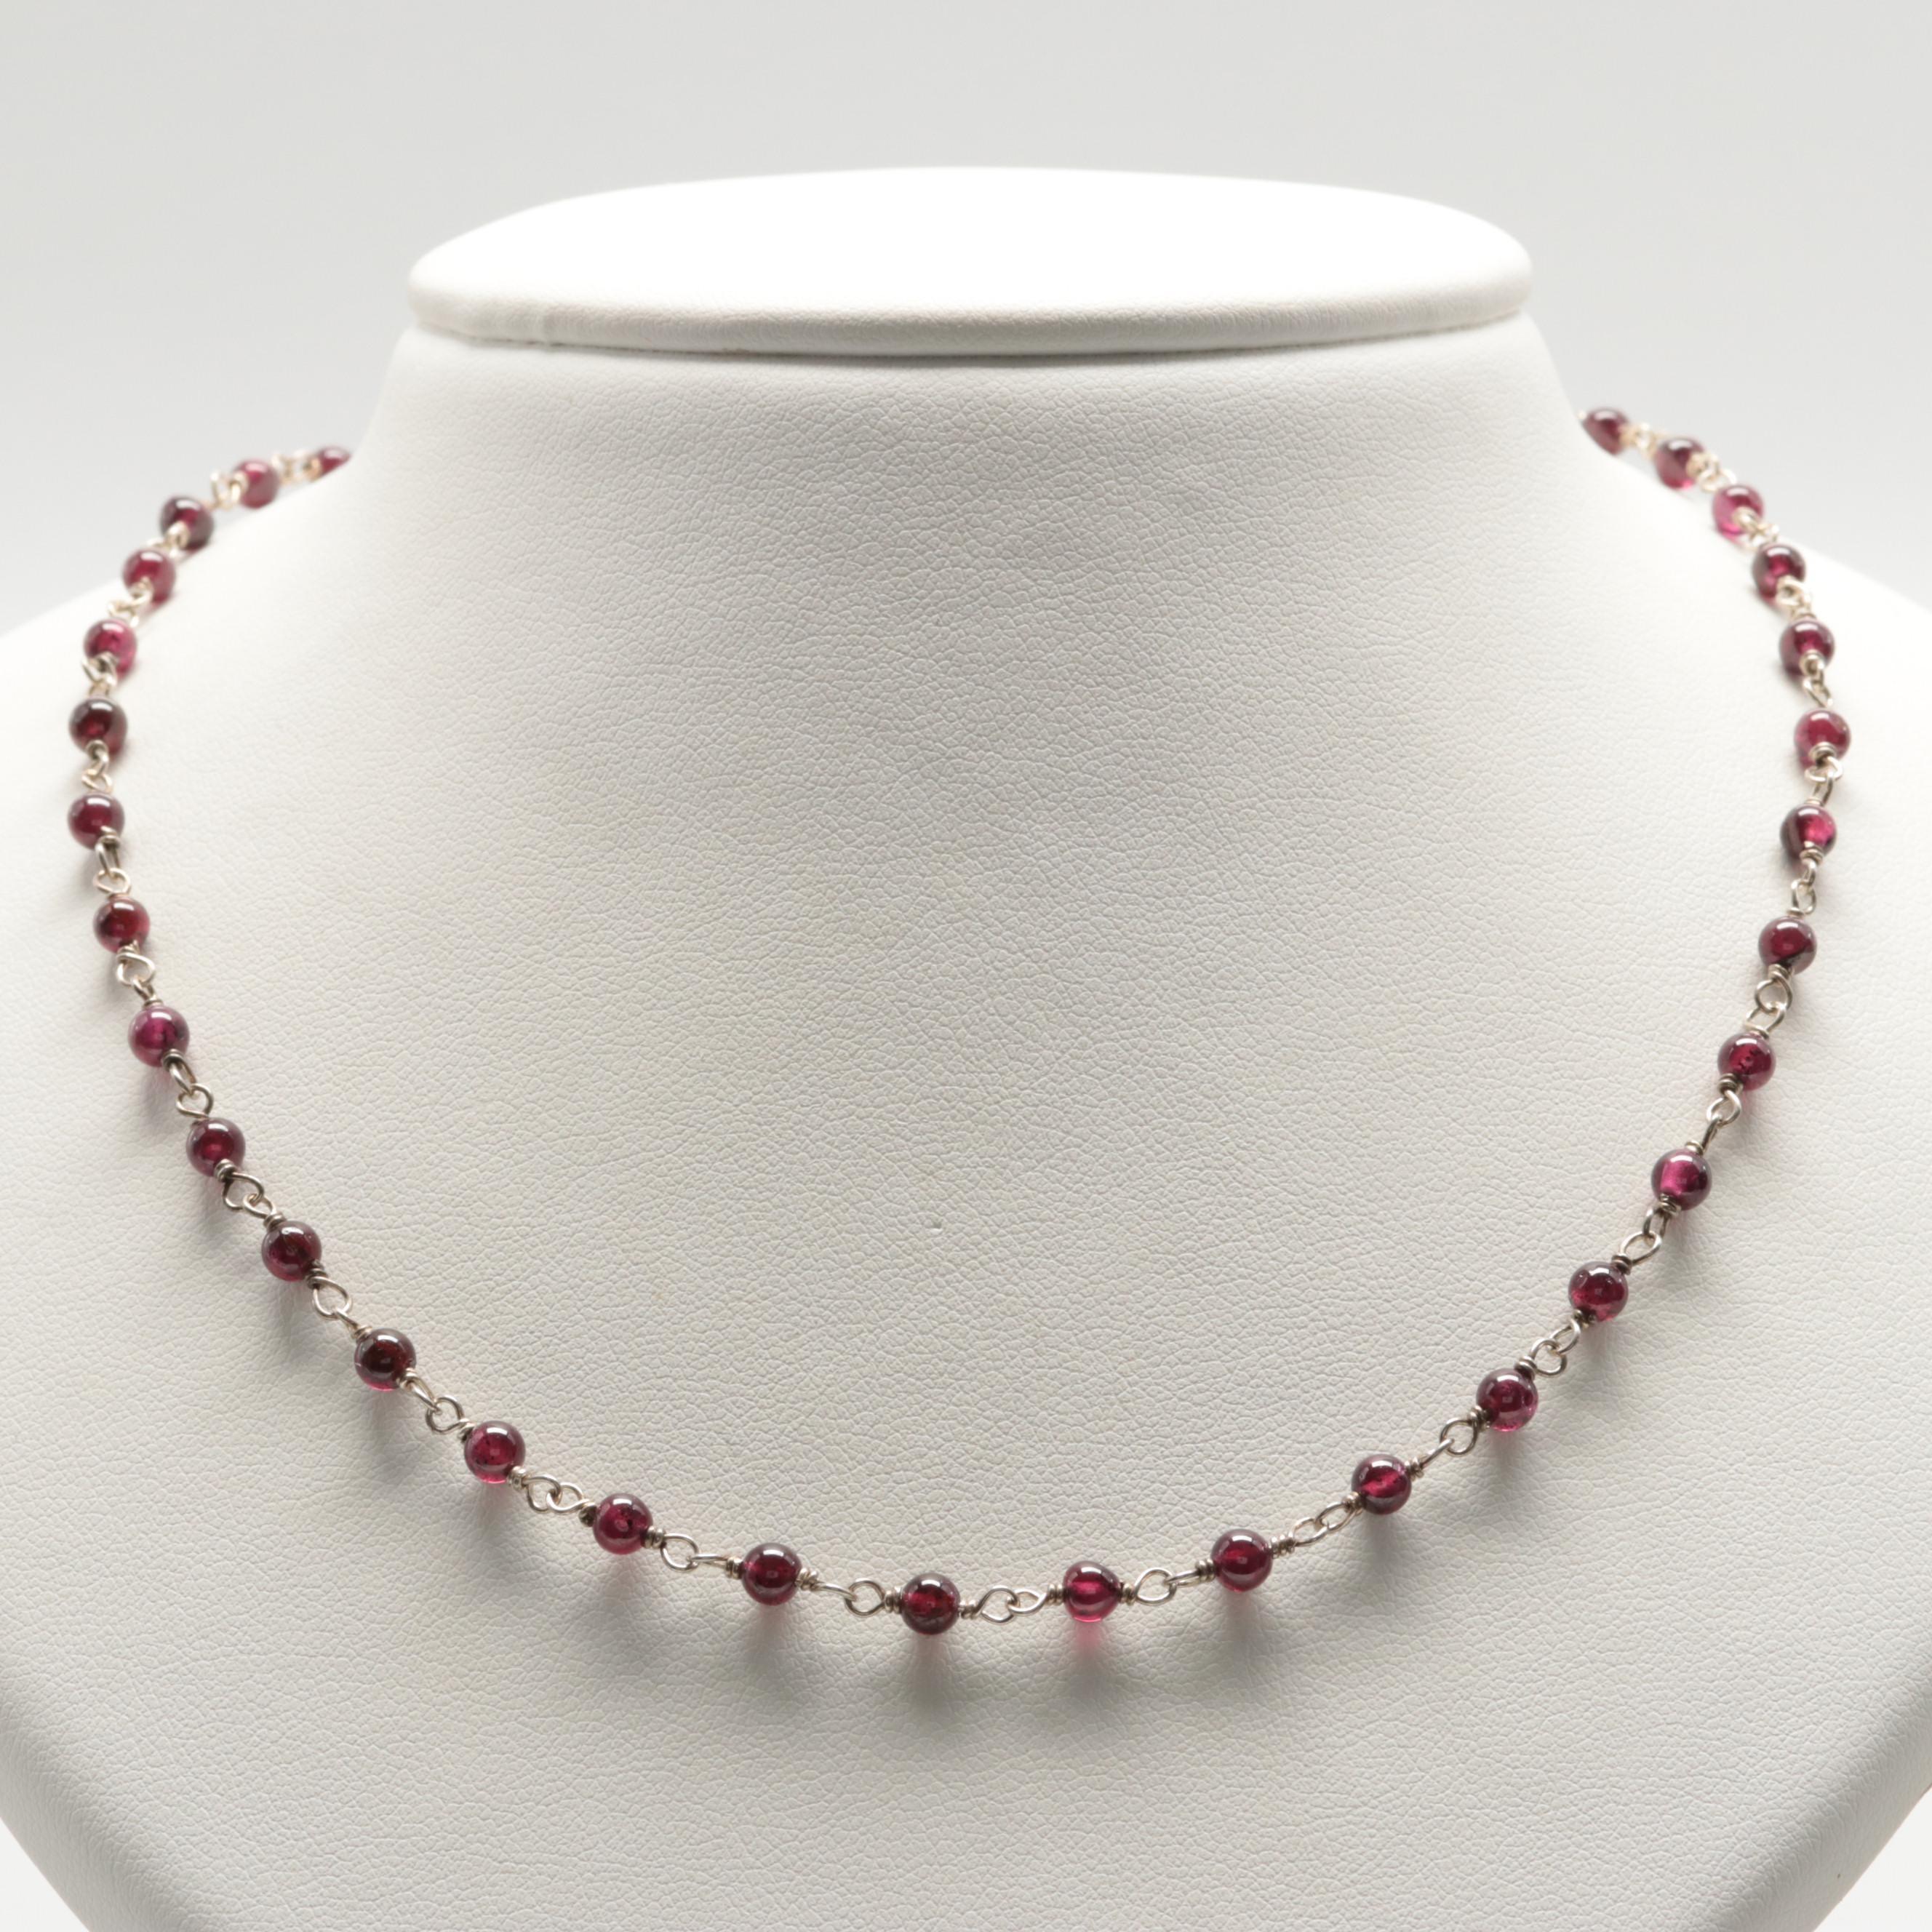 Sterling Silver Rhodolite Garnet Bead Necklace